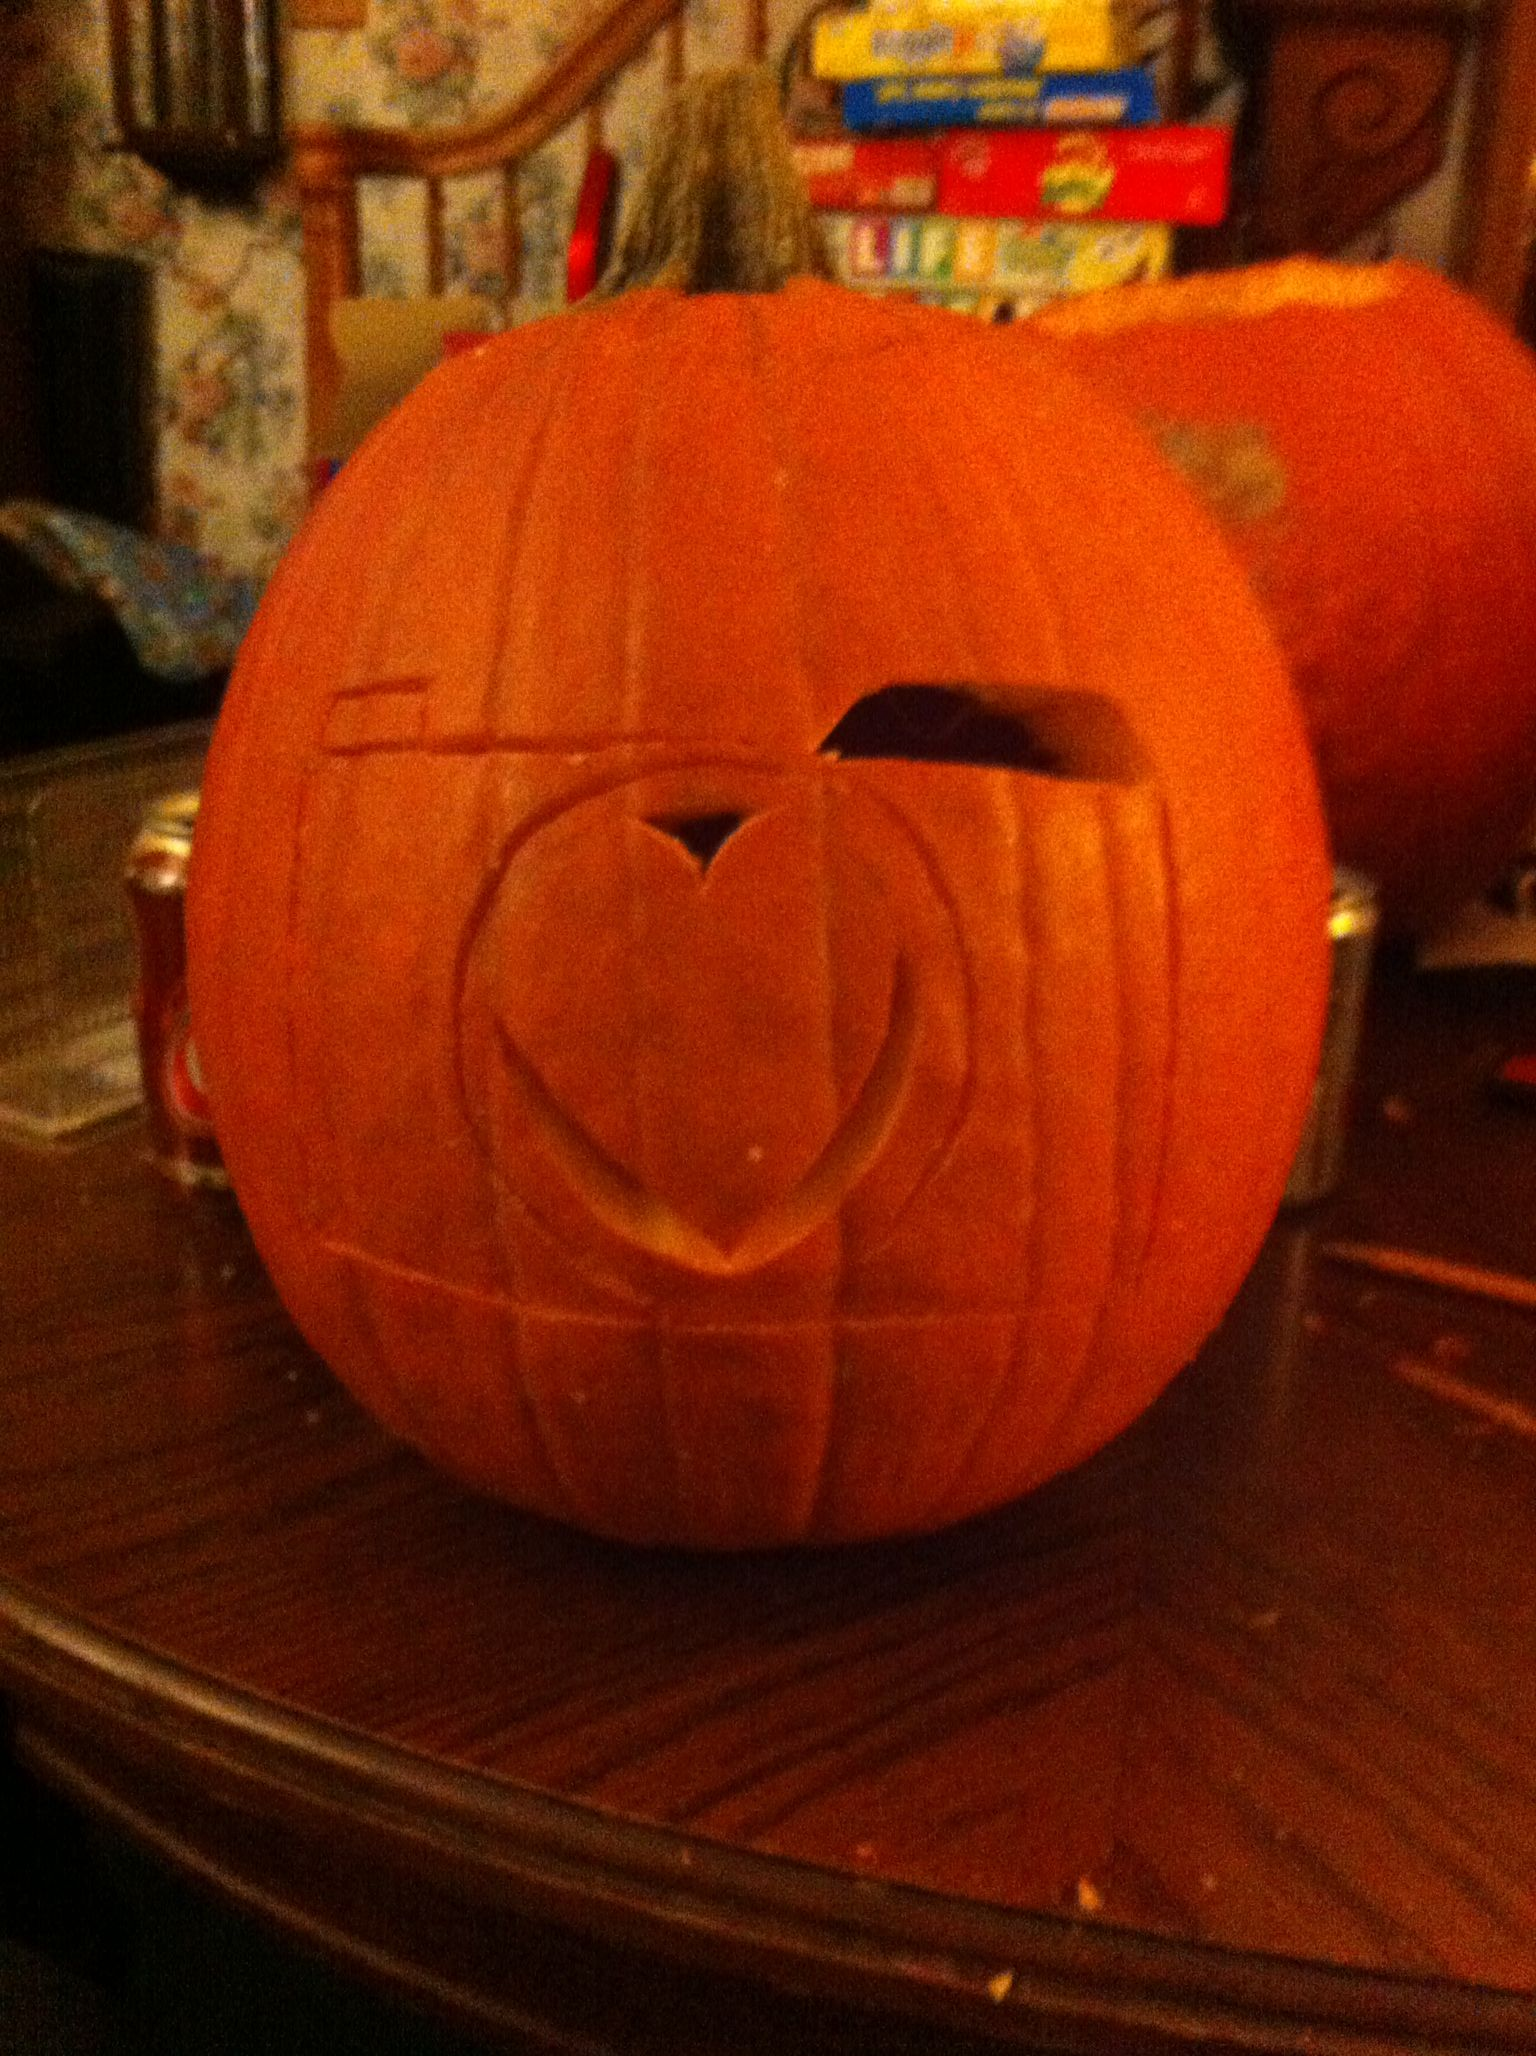 Camera pumpkin carving A very simple camera design carved into a